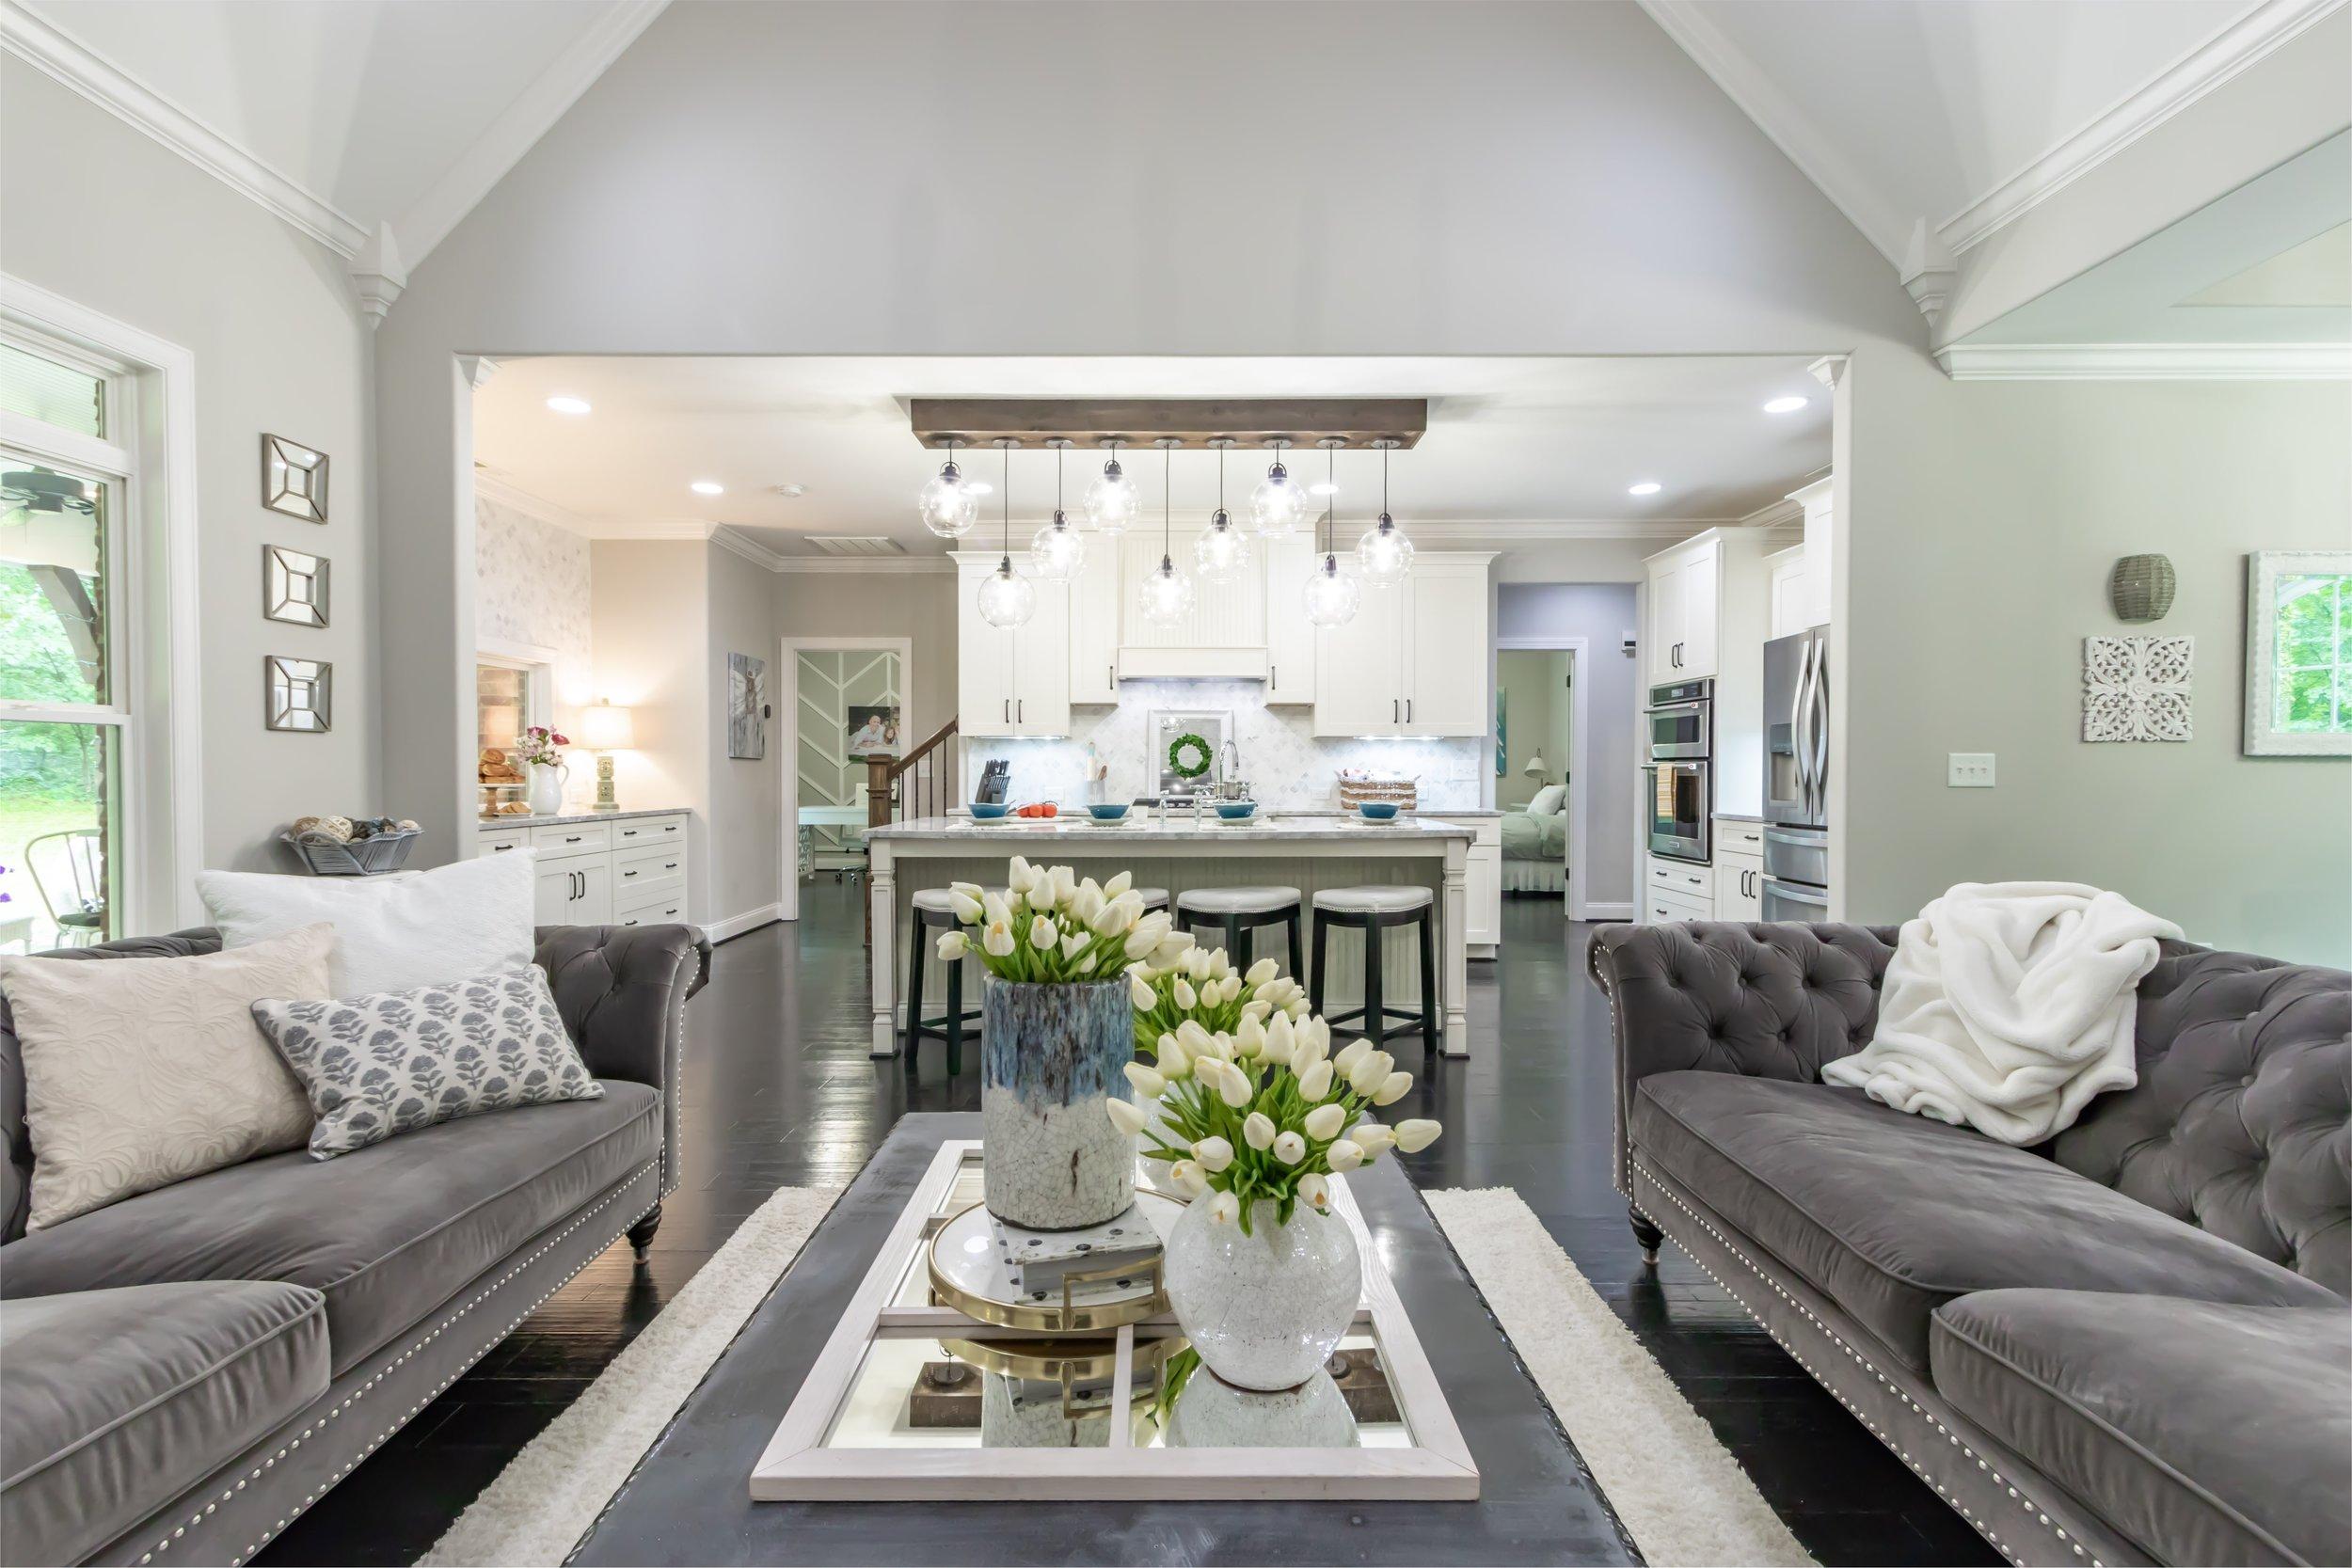 Jane Perfect Interiors